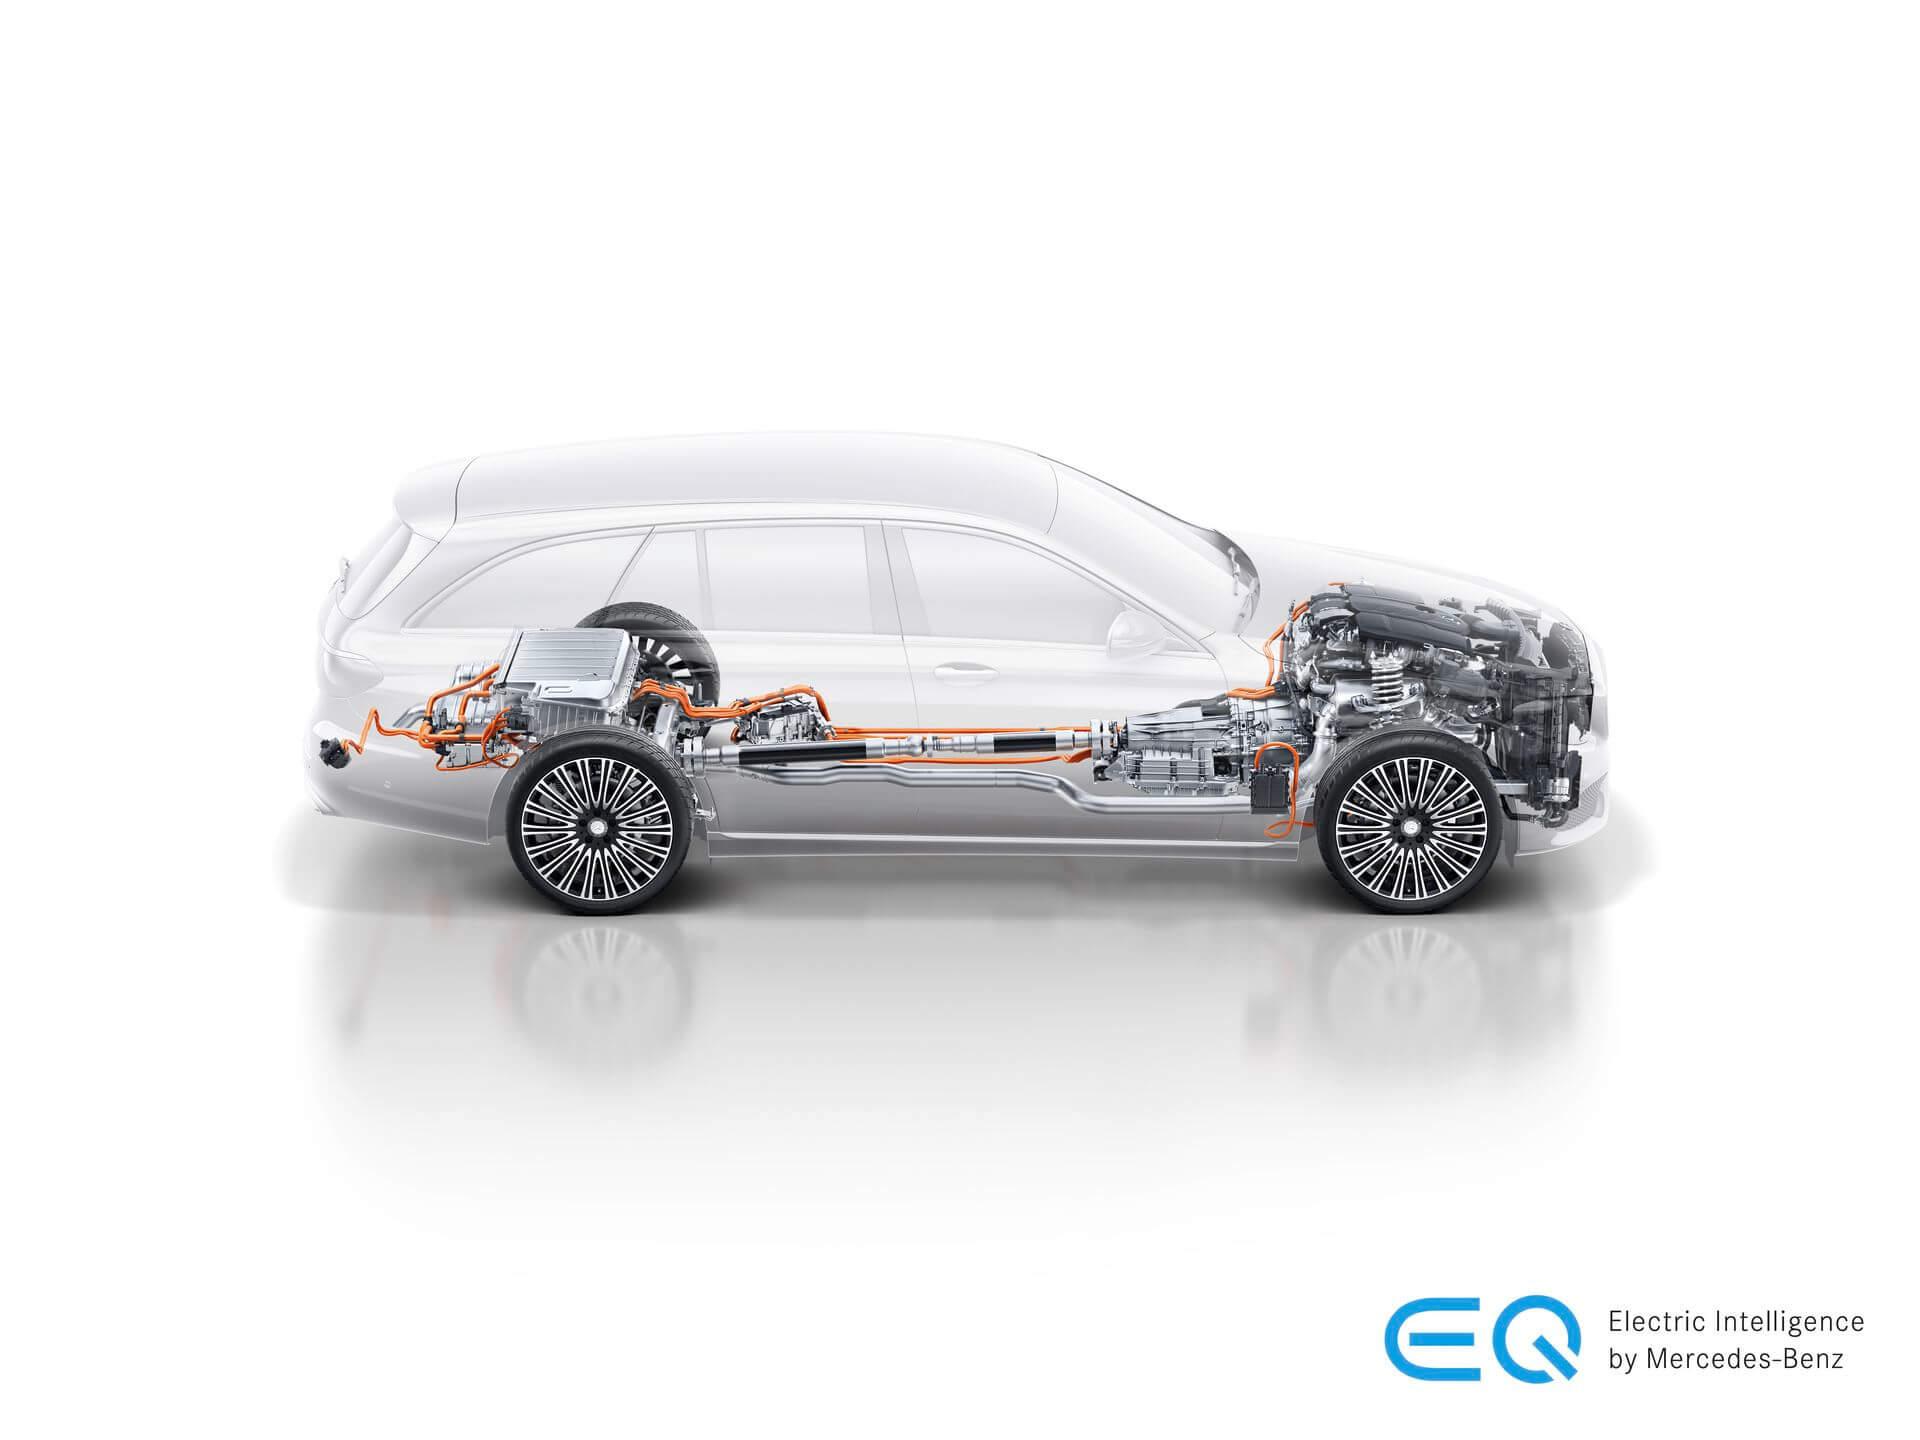 Cиловая установка Mercedes-Benz E300e PHEV